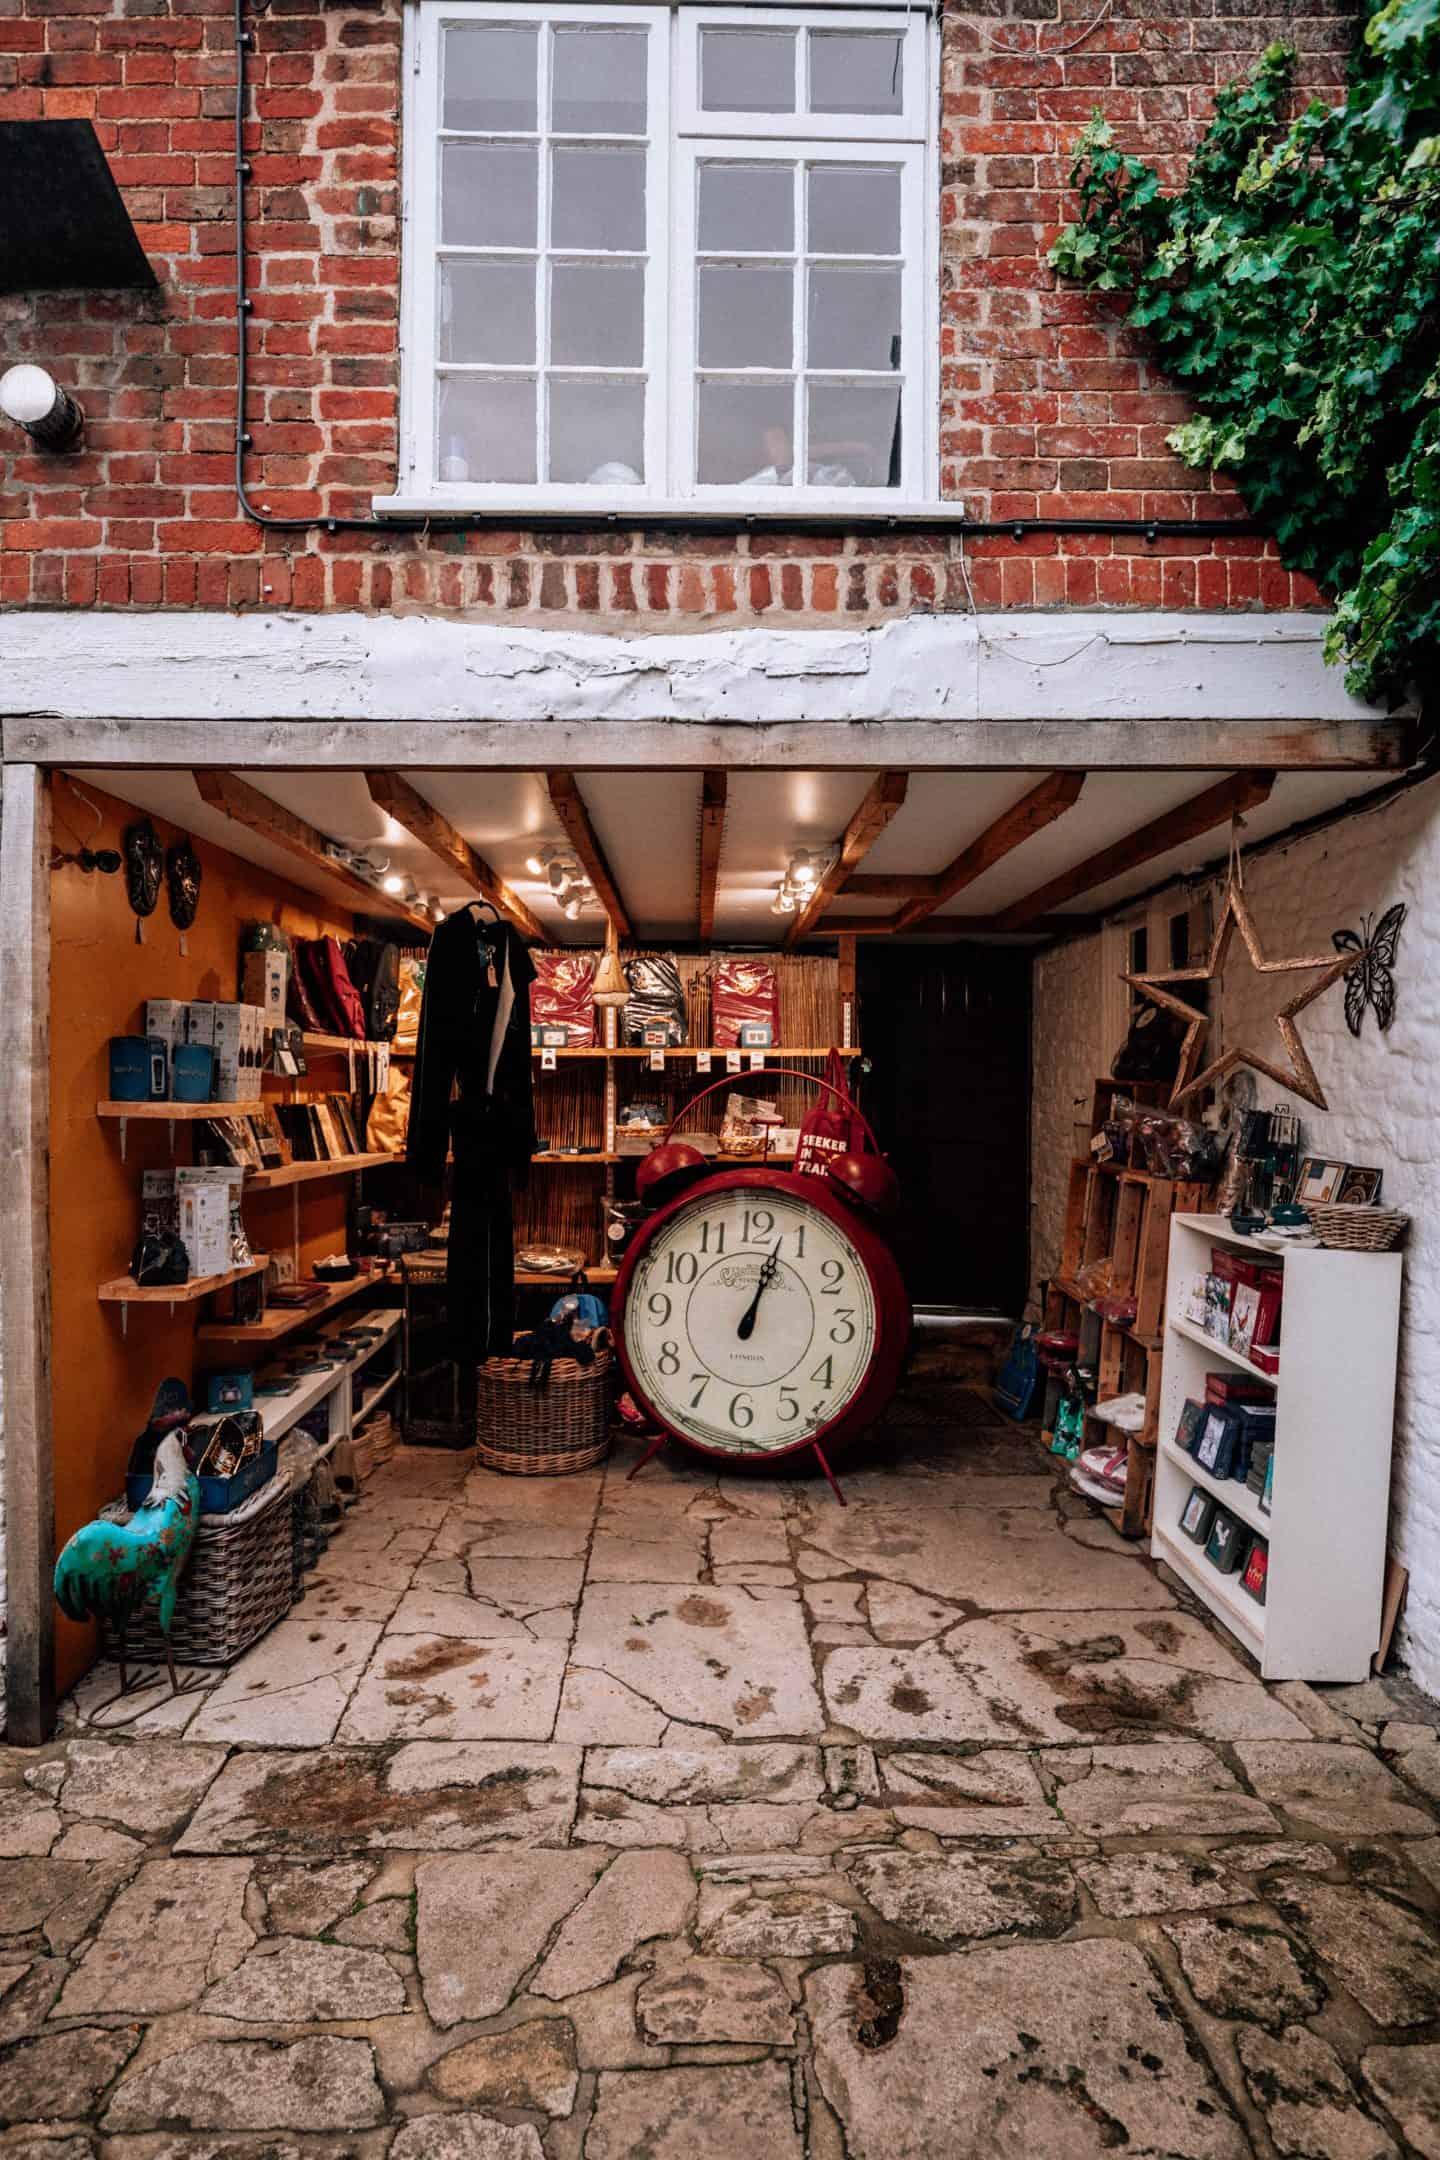 Harry Potter Village Clock in Lacock